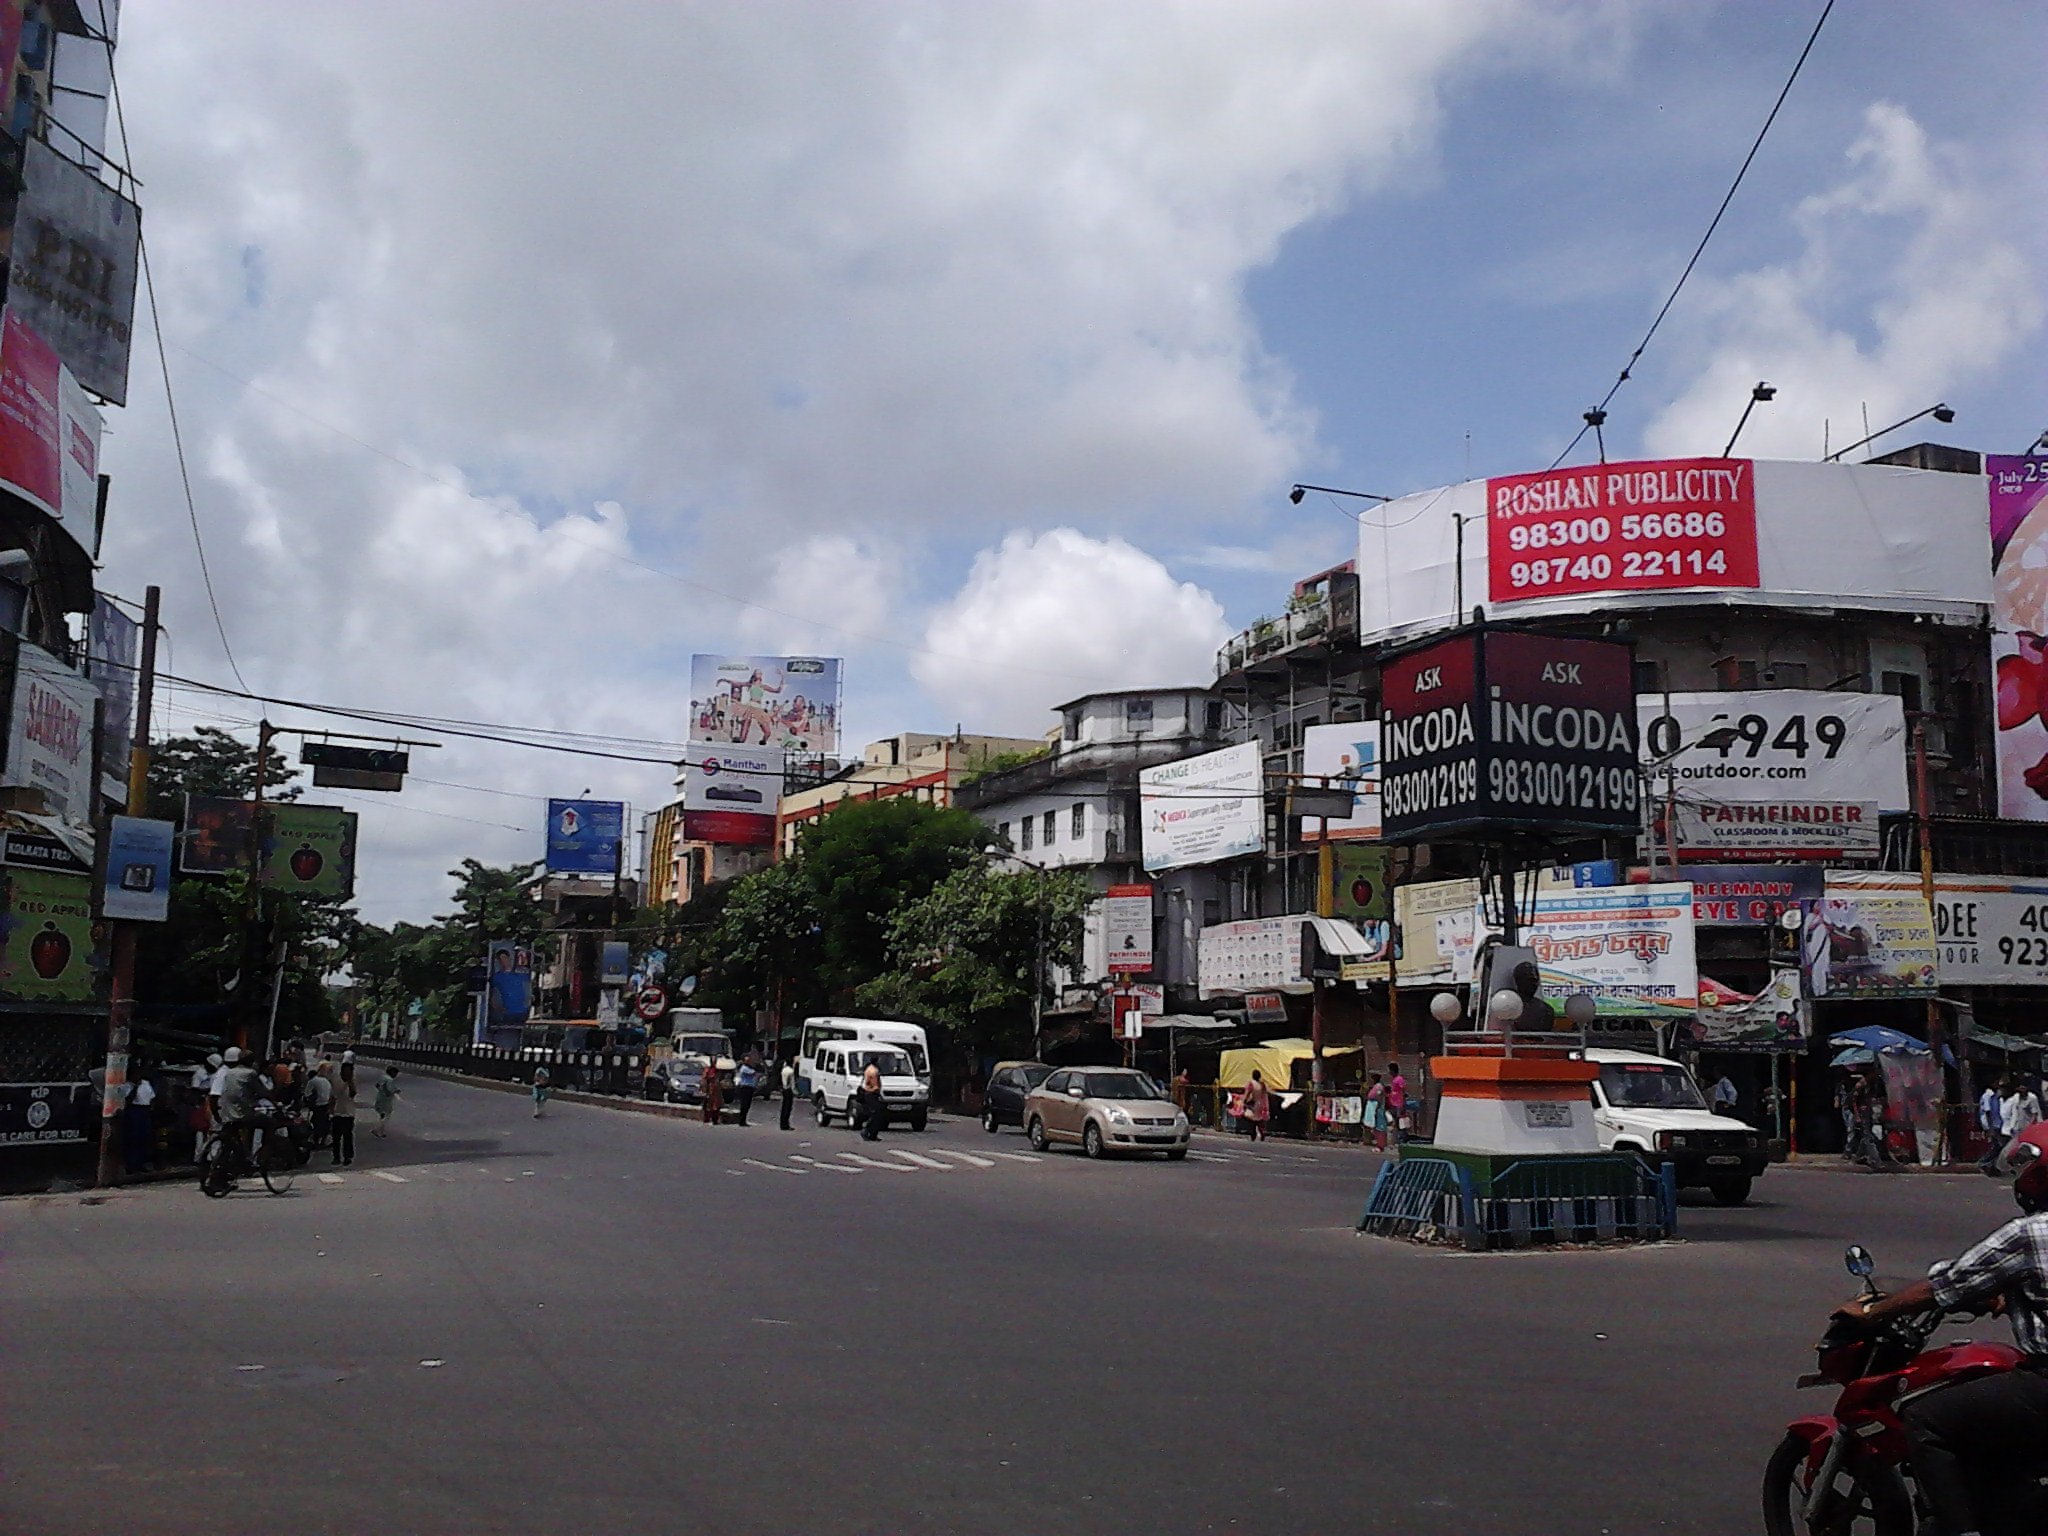 File:Hazra Crossing - Kolkata 2011-07-14 00396.jpg - Wikimedia Commons